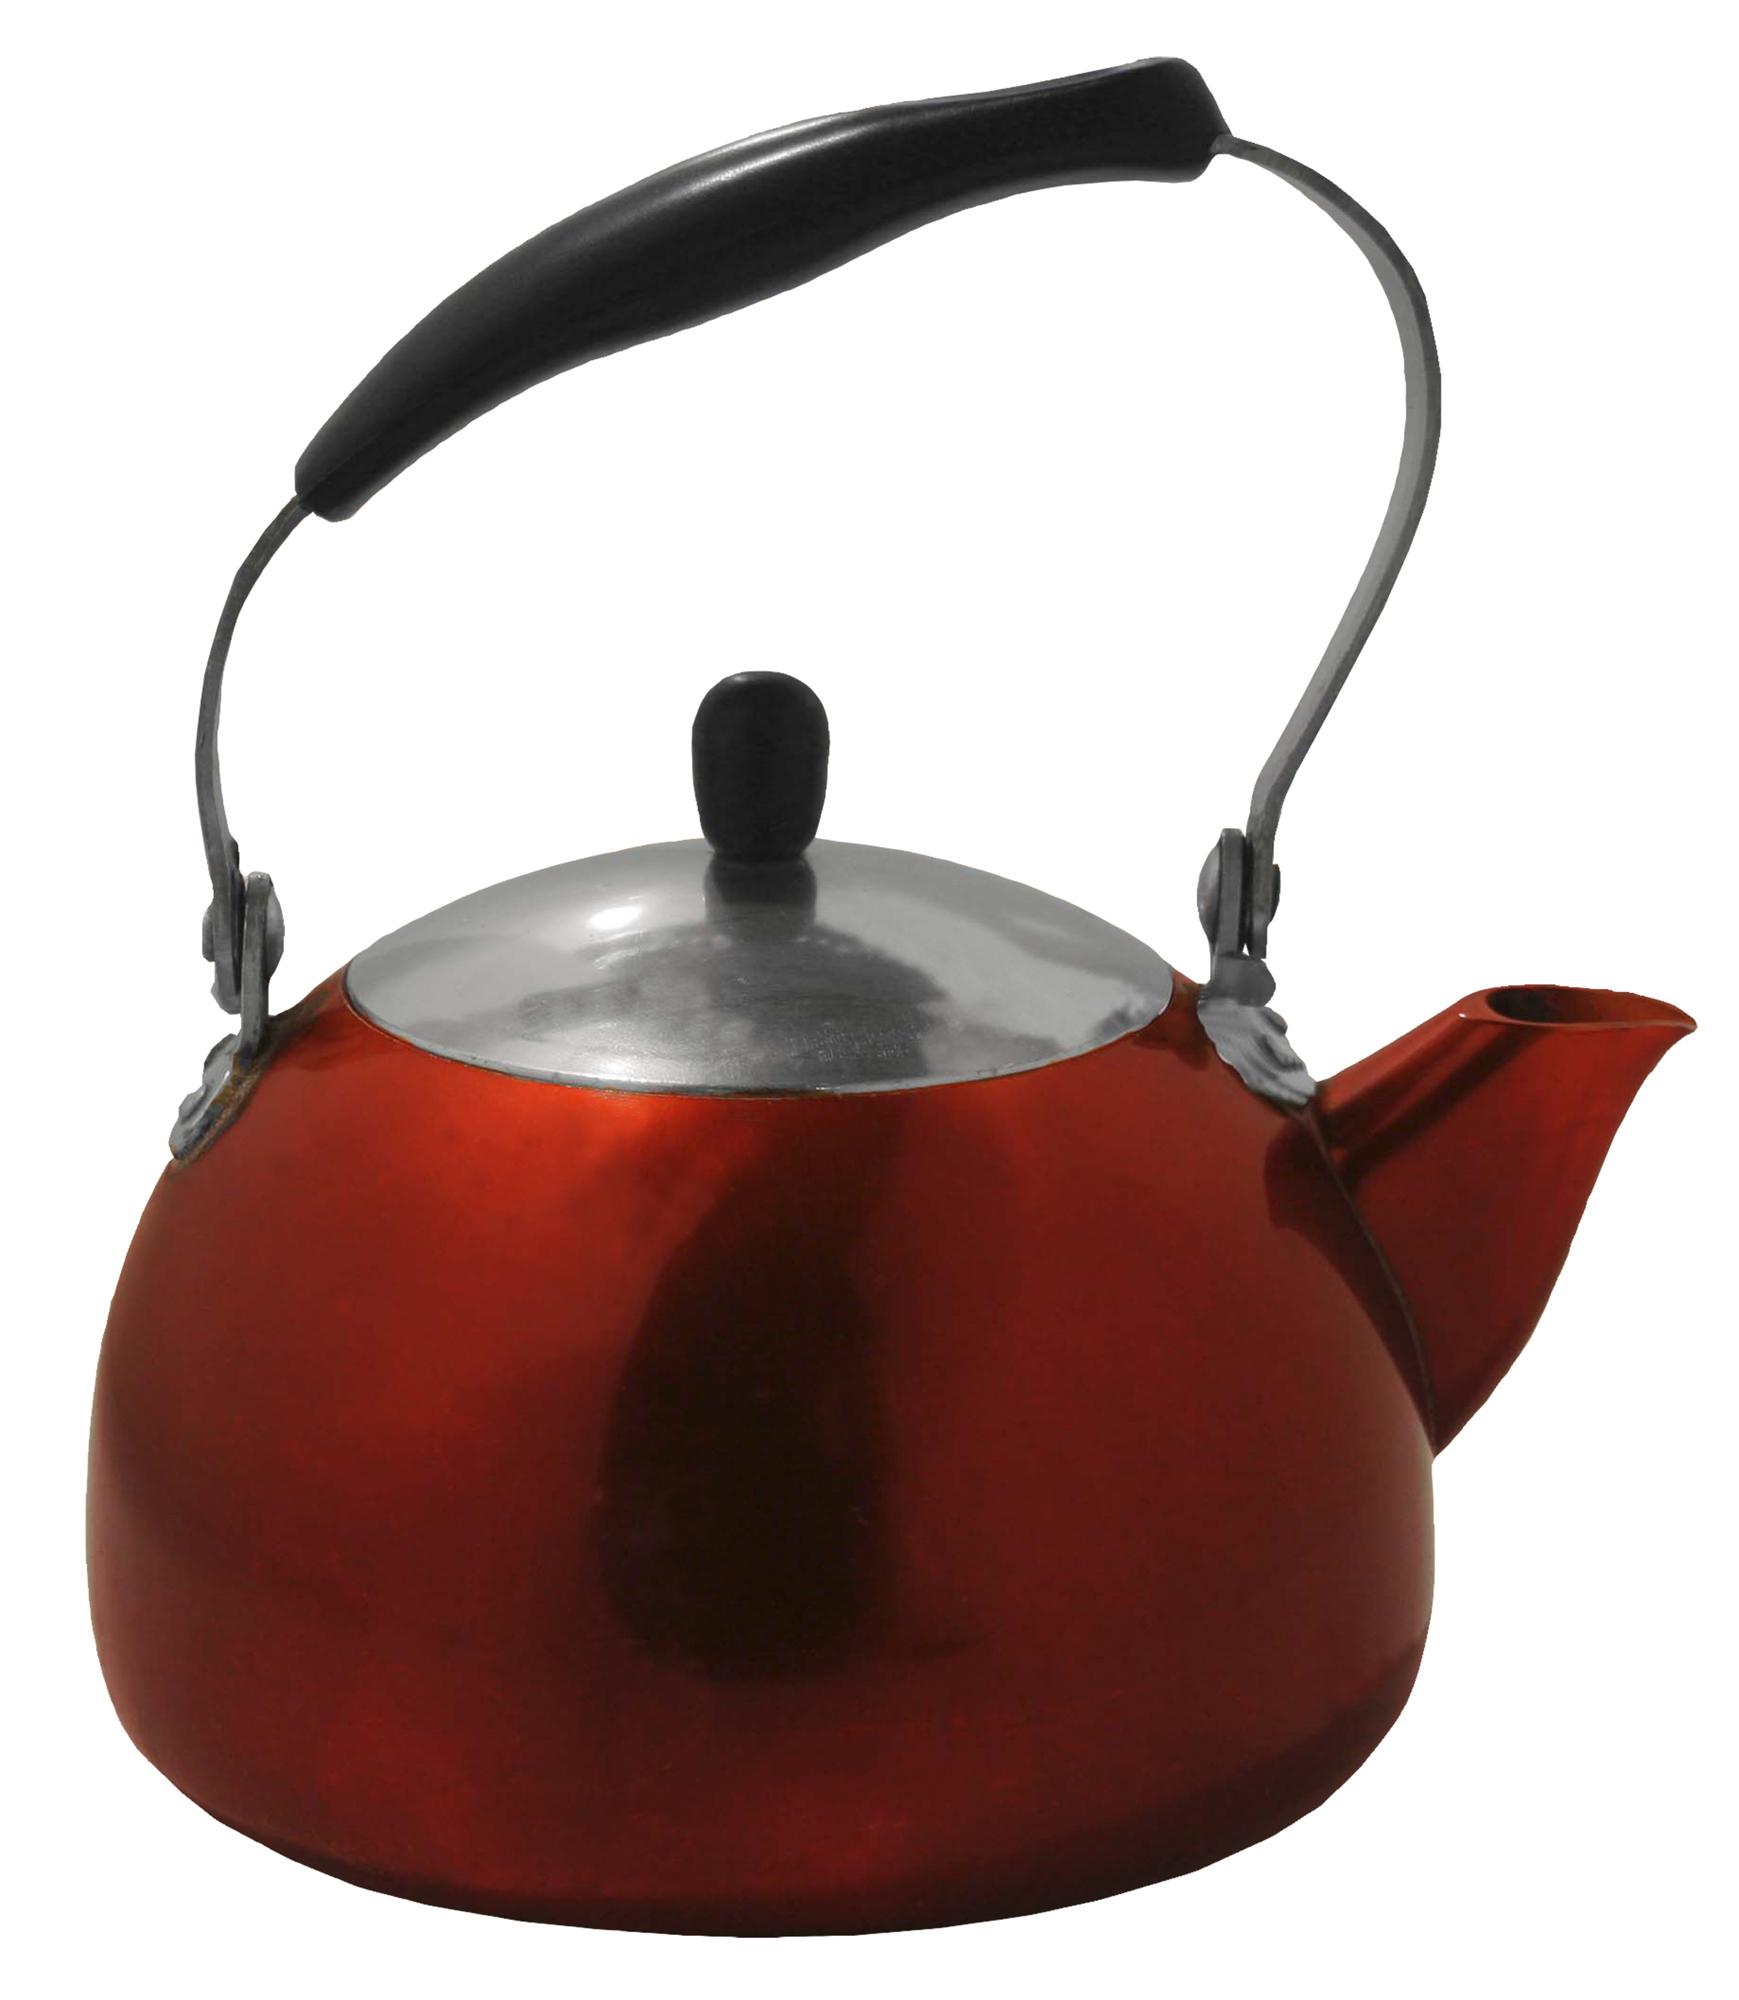 Rød kaffekjele